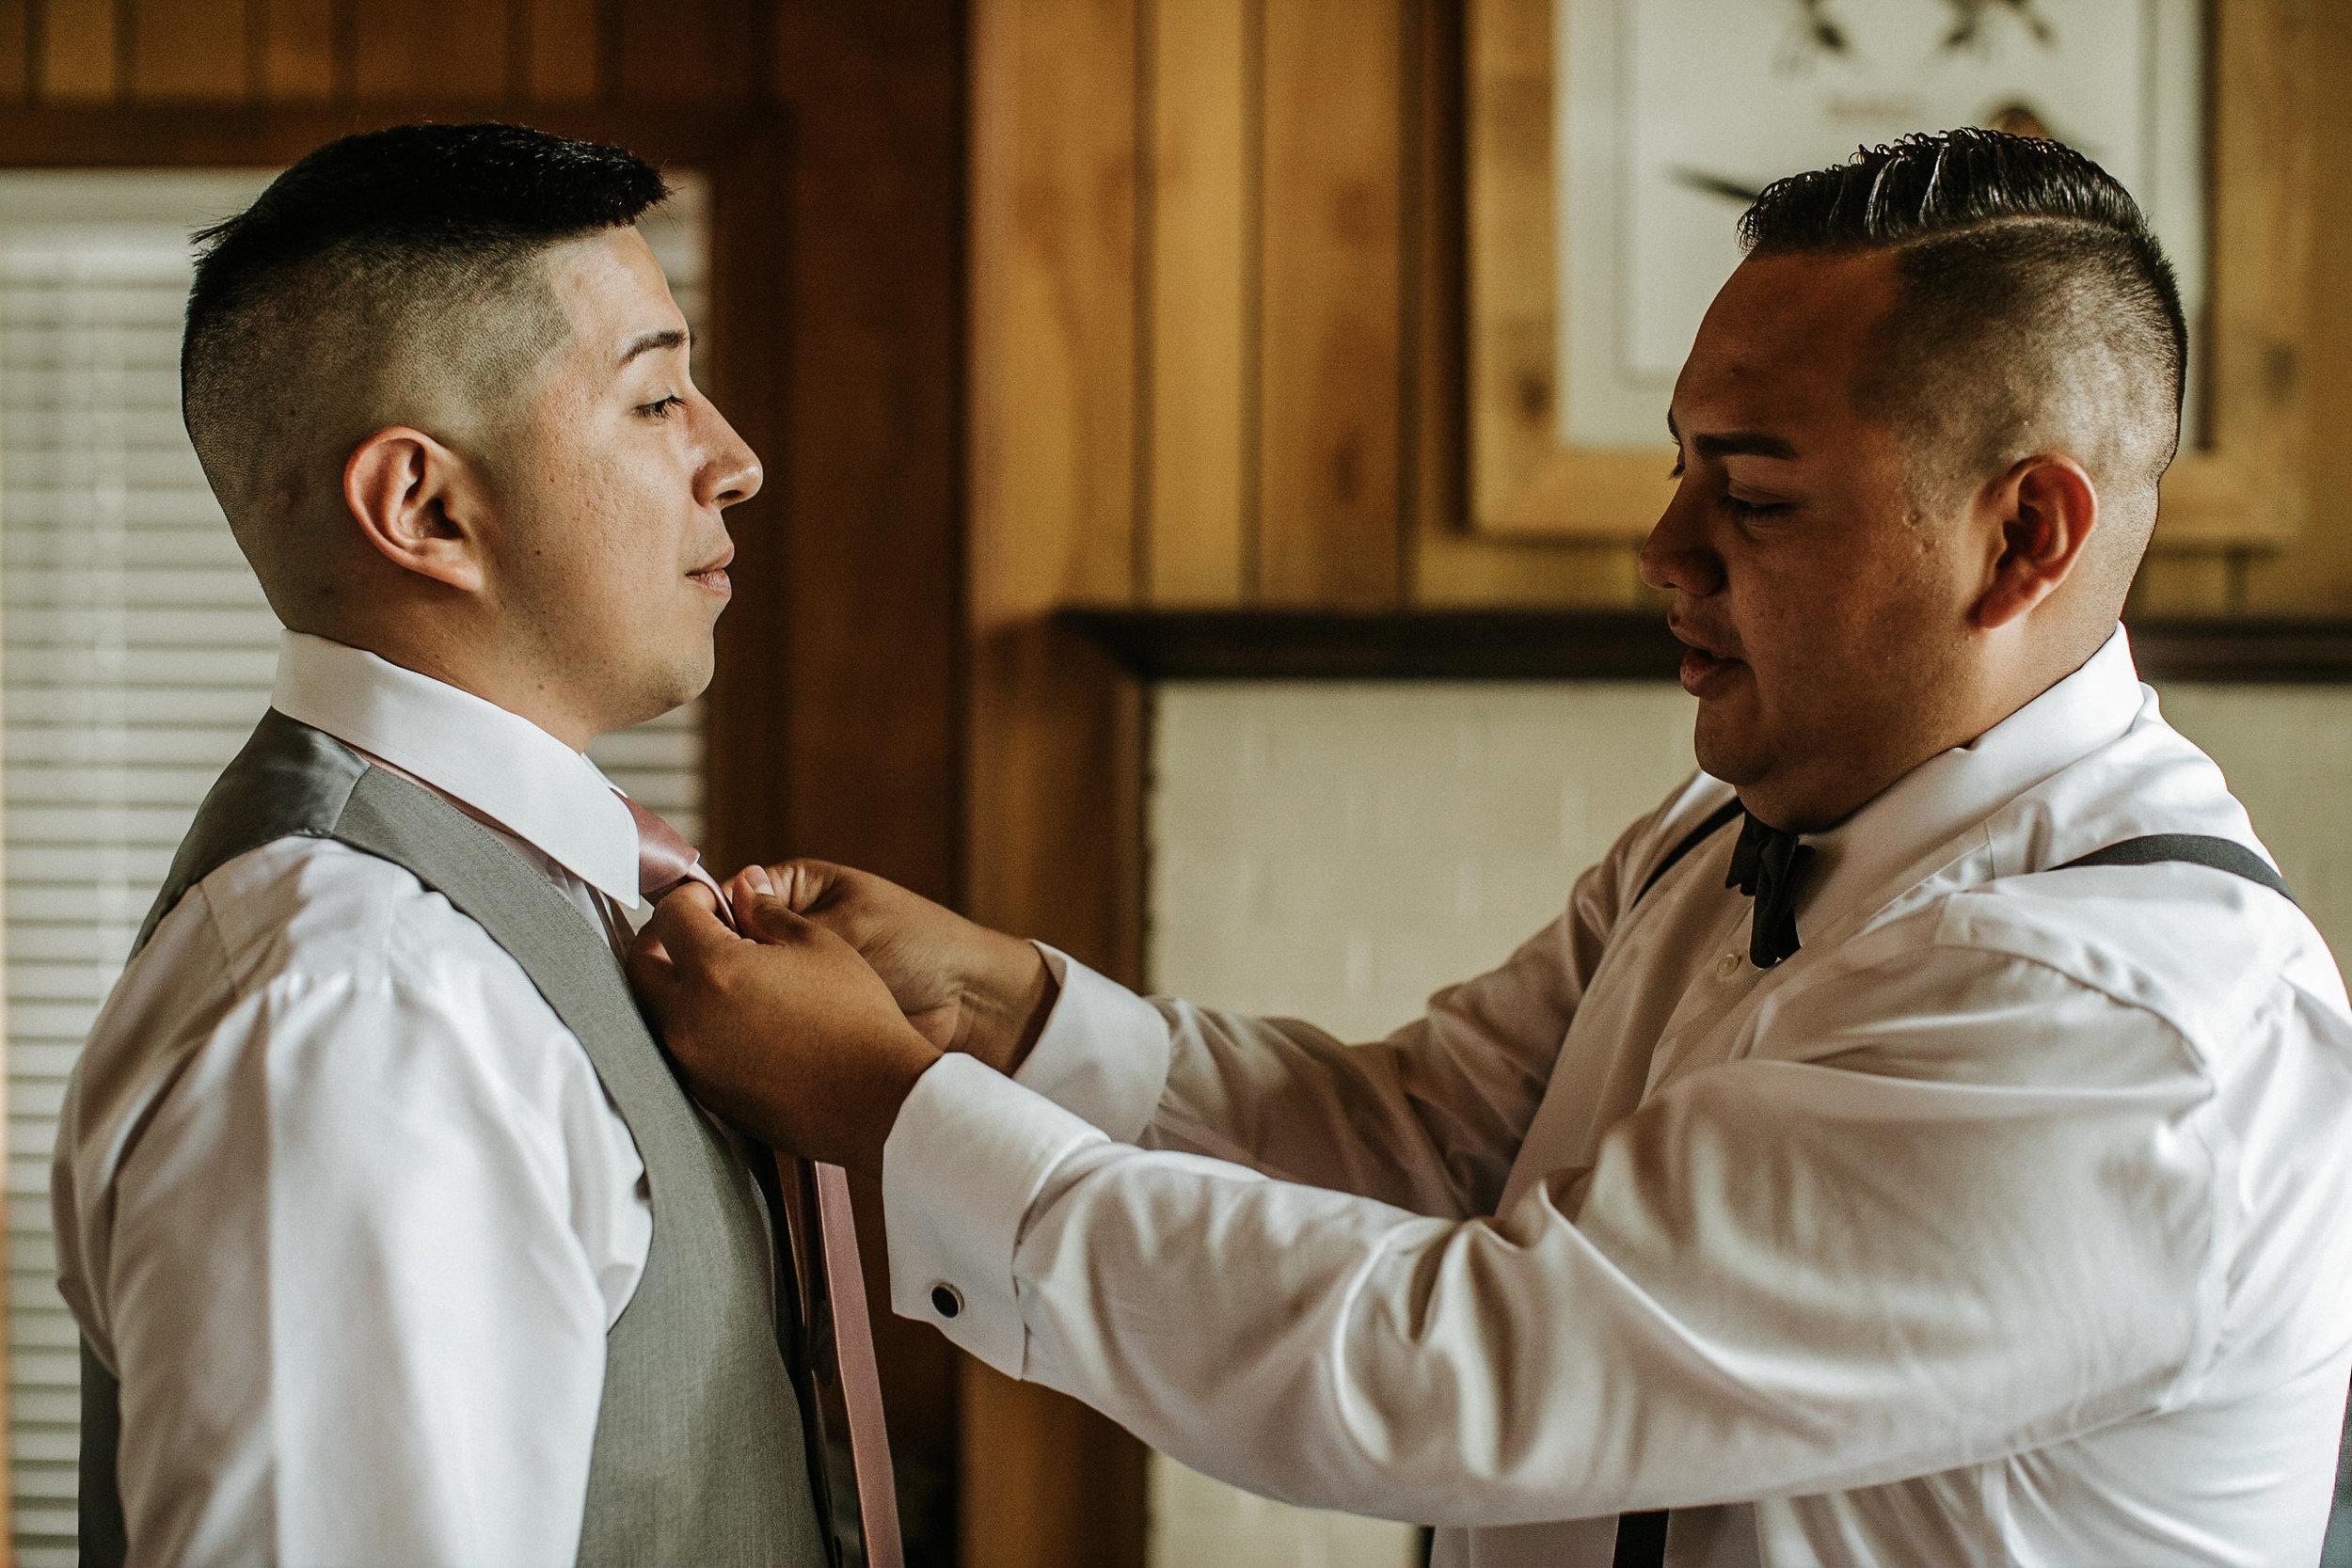 Groom straightening groomsmen's tie